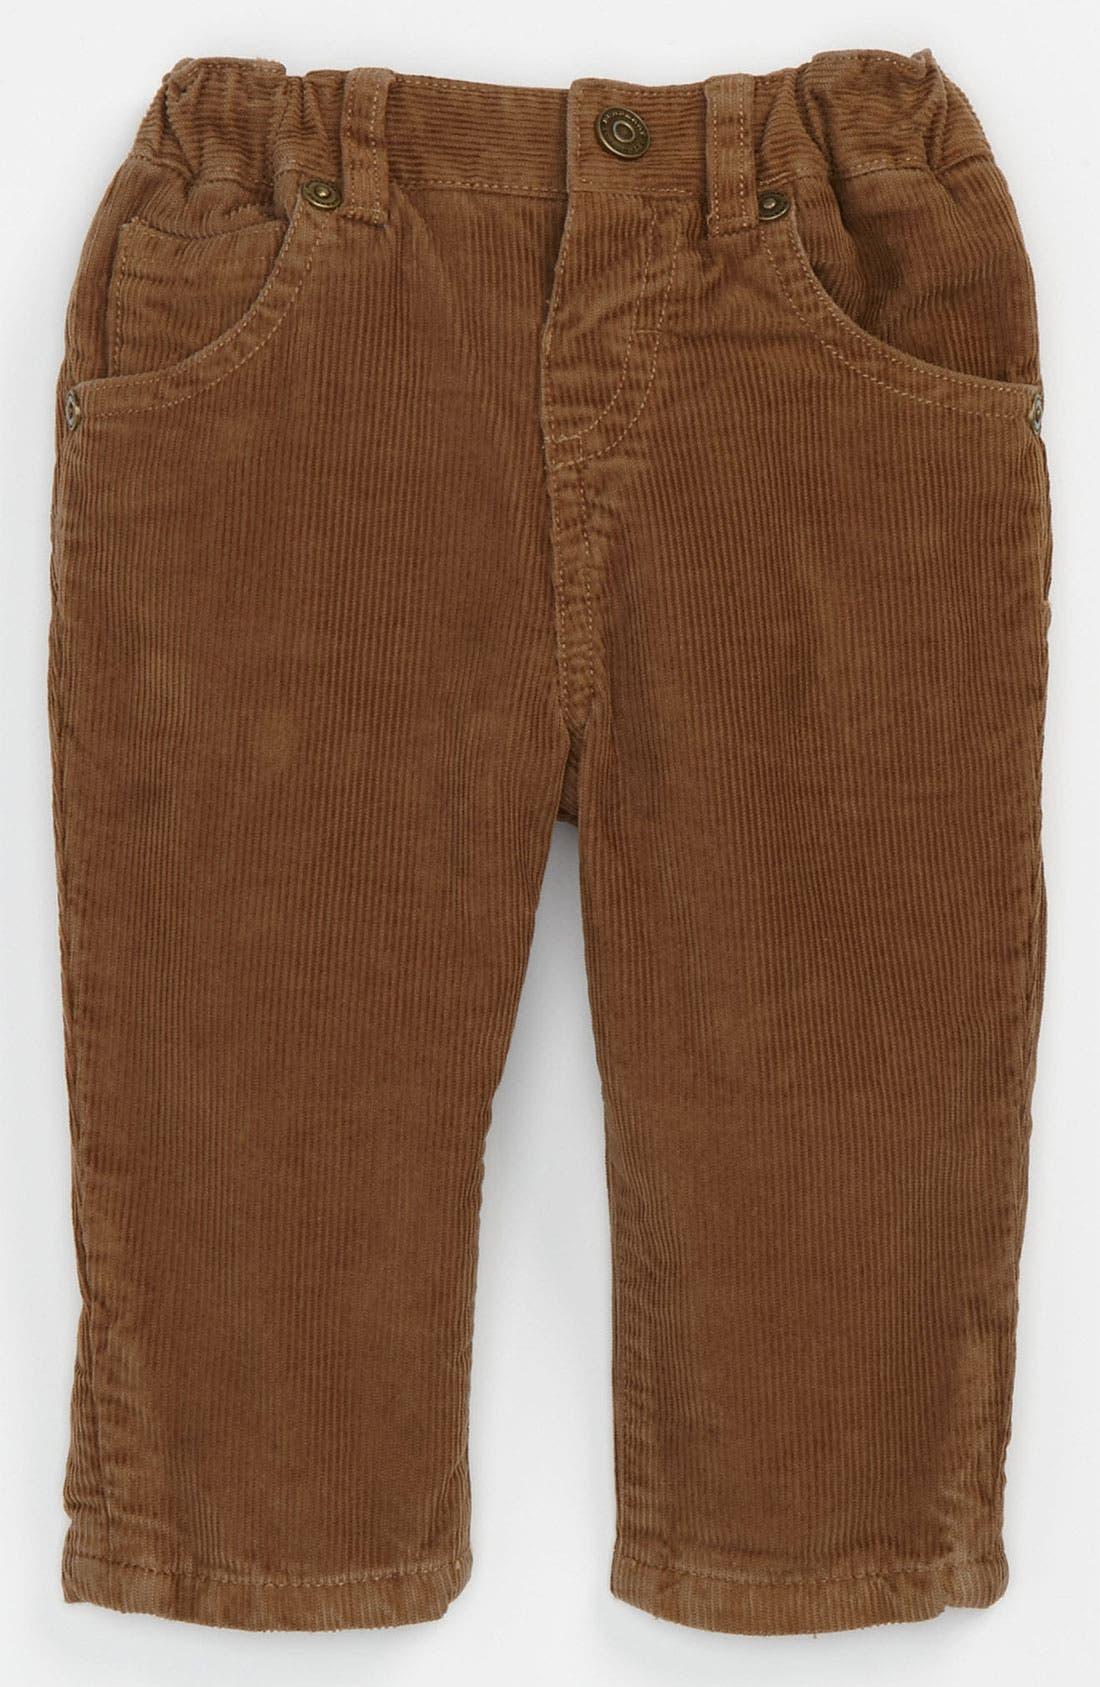 Alternate Image 1 Selected - Burberry Corduroy Pants (Infant)